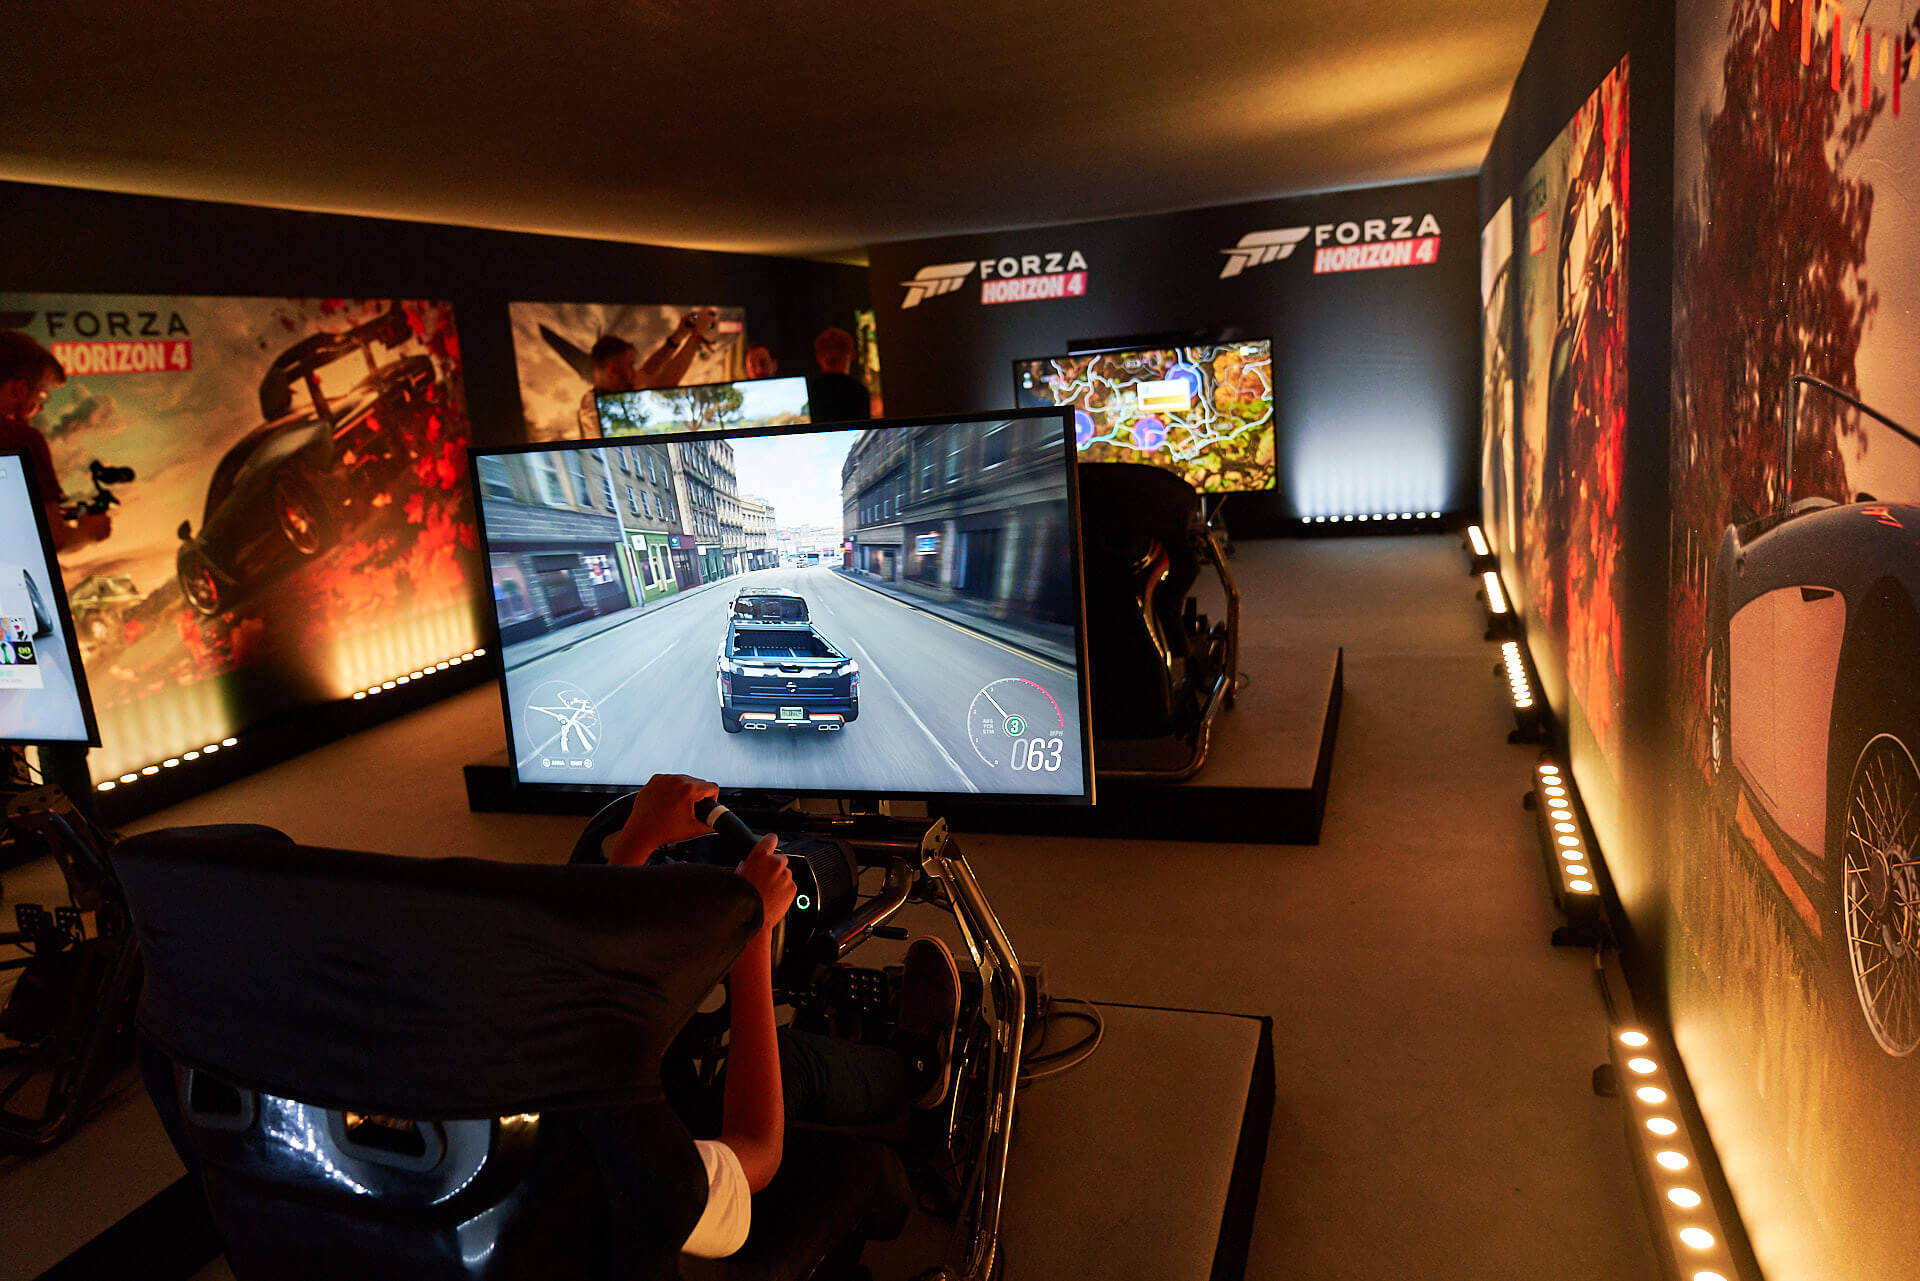 Living the Forza Horizon 4 Life at the Prestigious Grounds